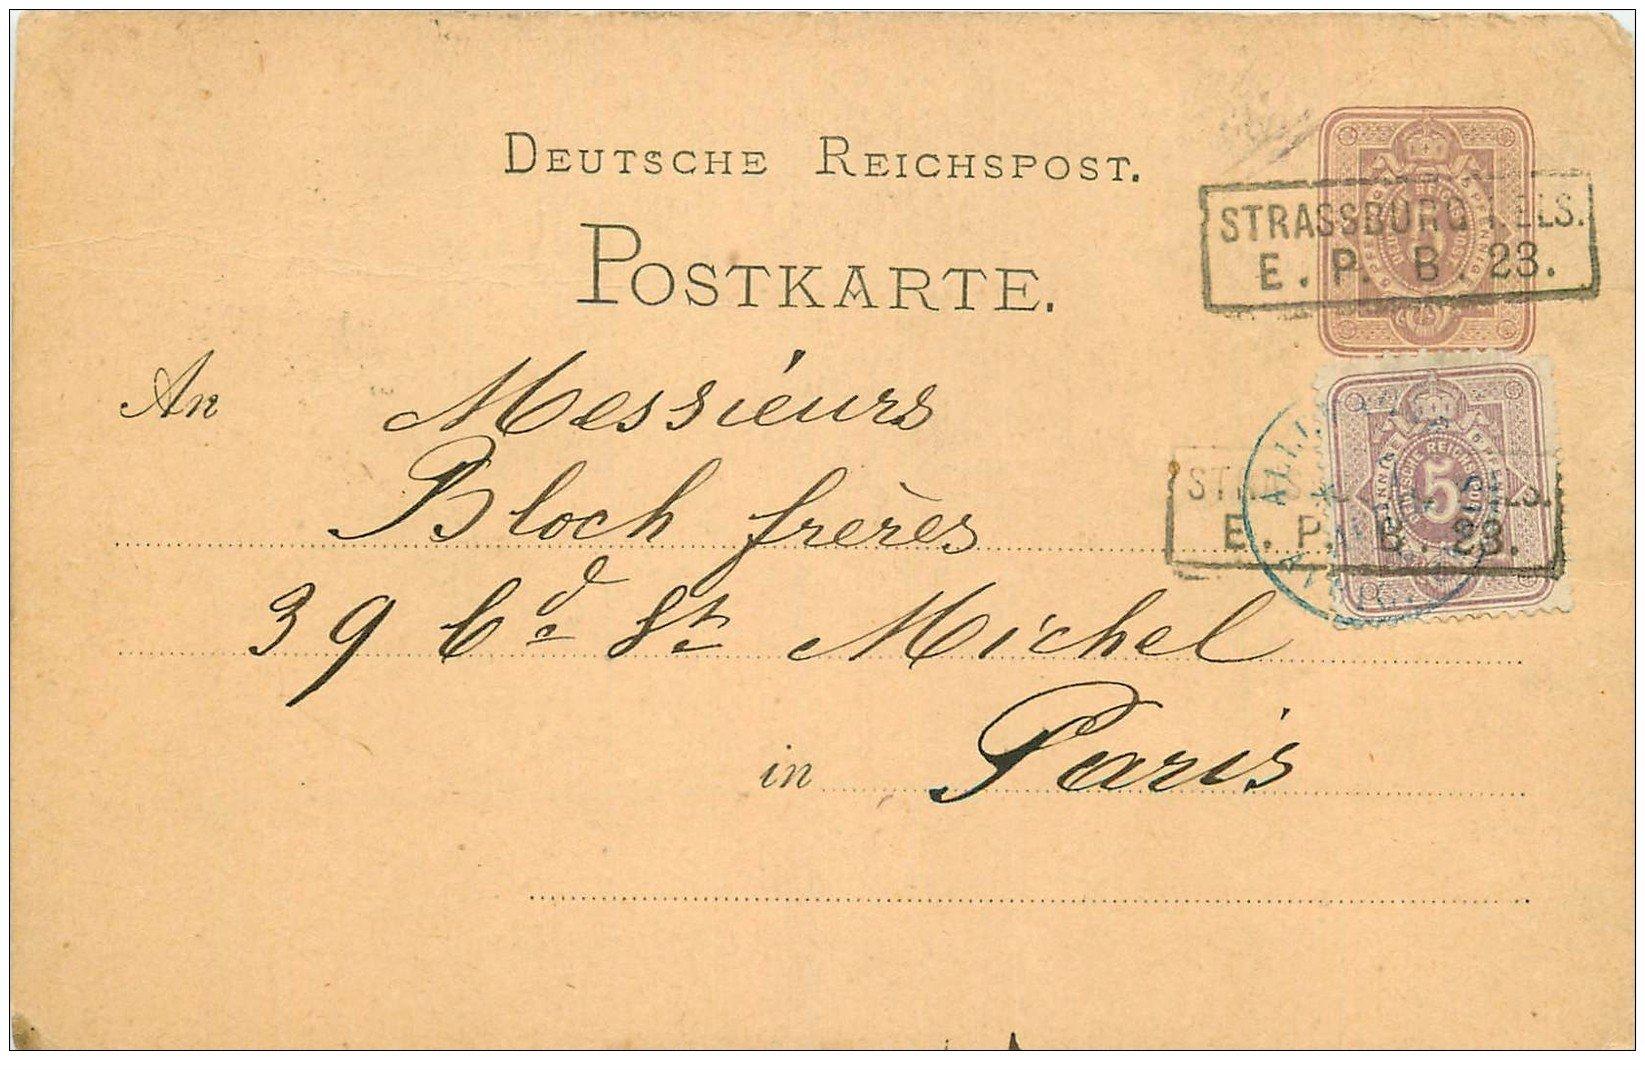 67 strasbourg strassburg carte correspondance pour bloch paris vers 1877 1887. Black Bedroom Furniture Sets. Home Design Ideas